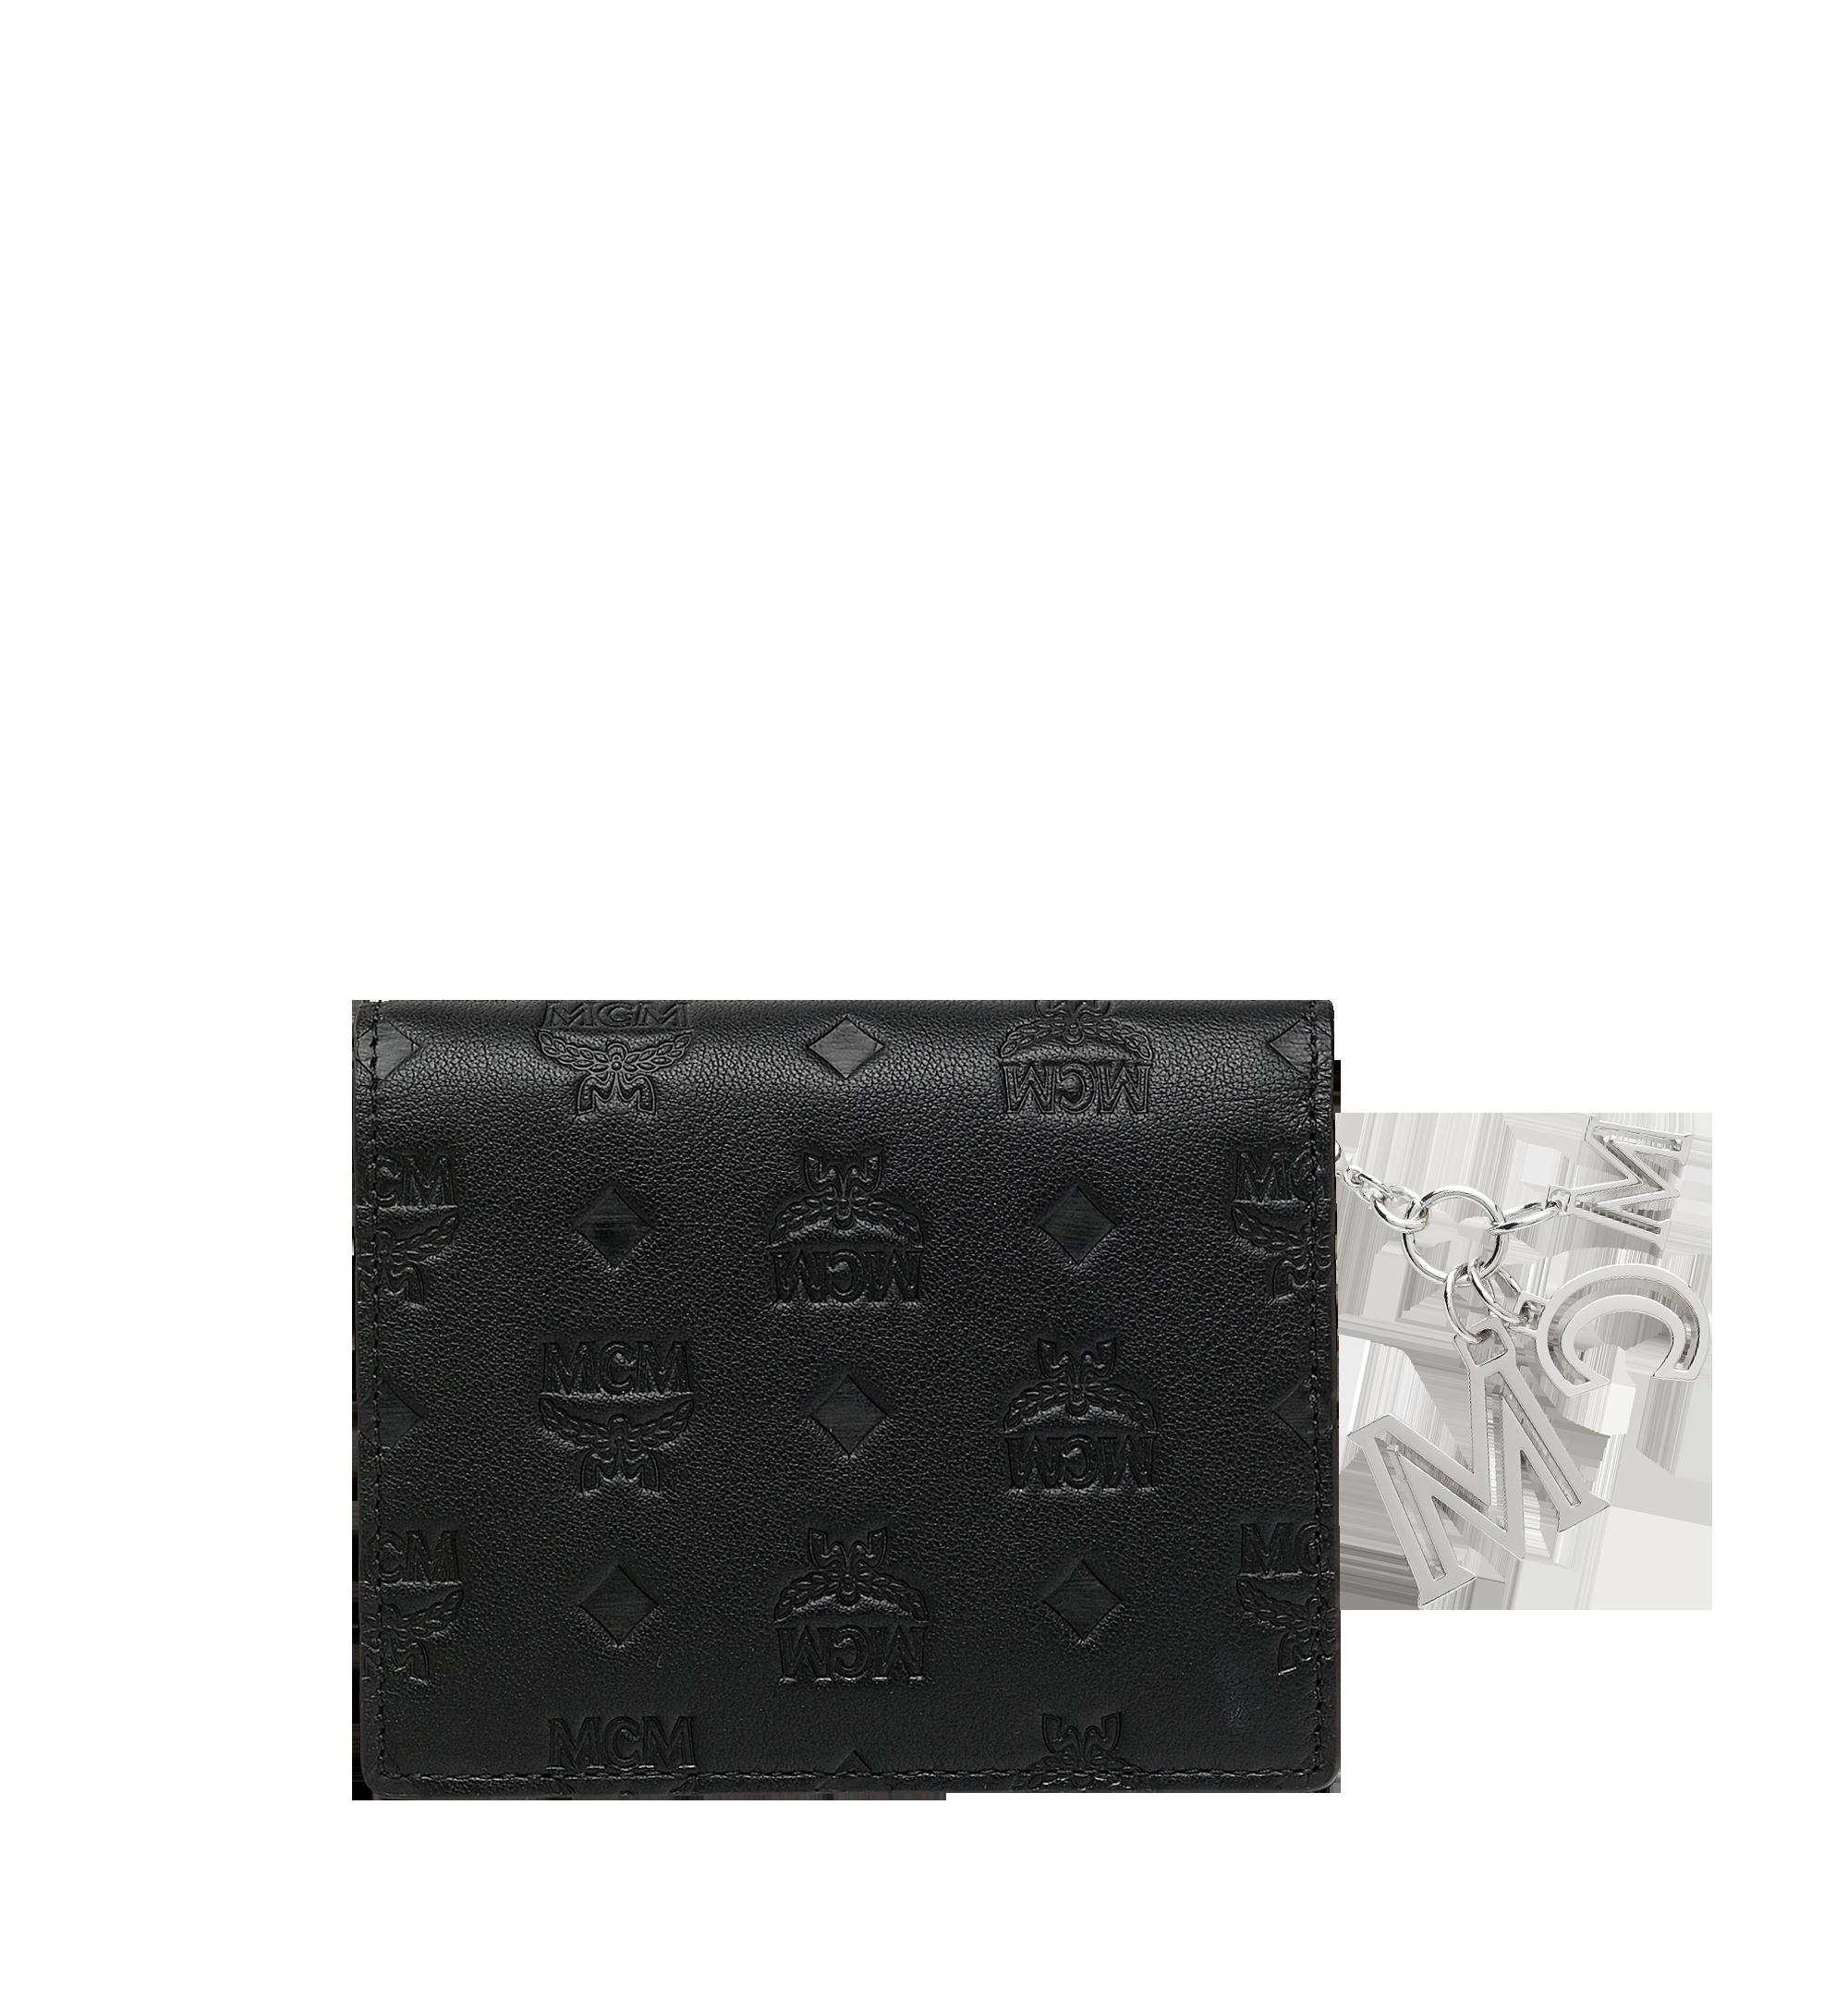 MCM Klara经典花纹皮革对折式钱包 Black MYS9SKM40BK001 更多视角 2